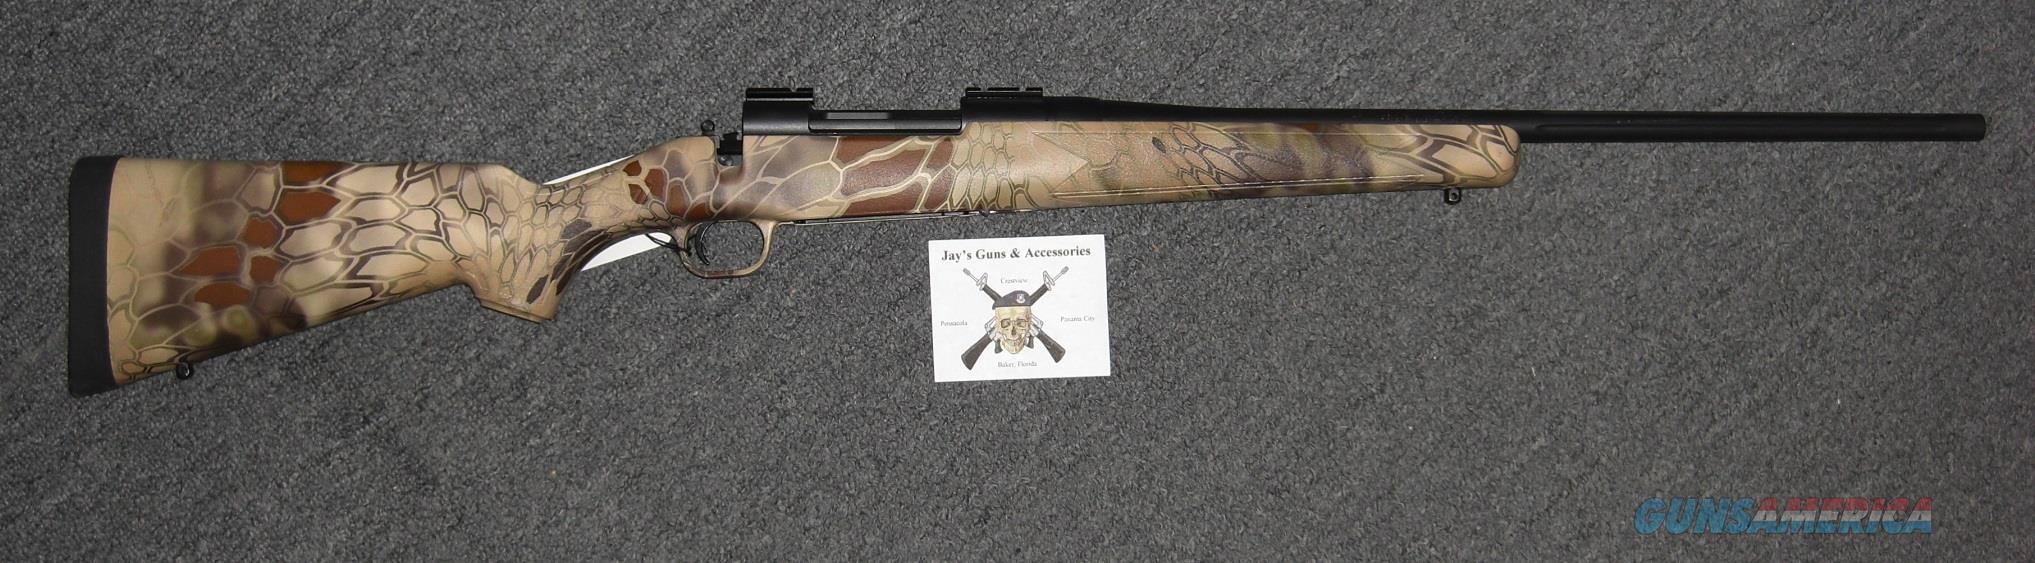 Mossberg Patriot w/Kryptec Finish Stock  Guns > Rifles > Mossberg Rifles > Patriot